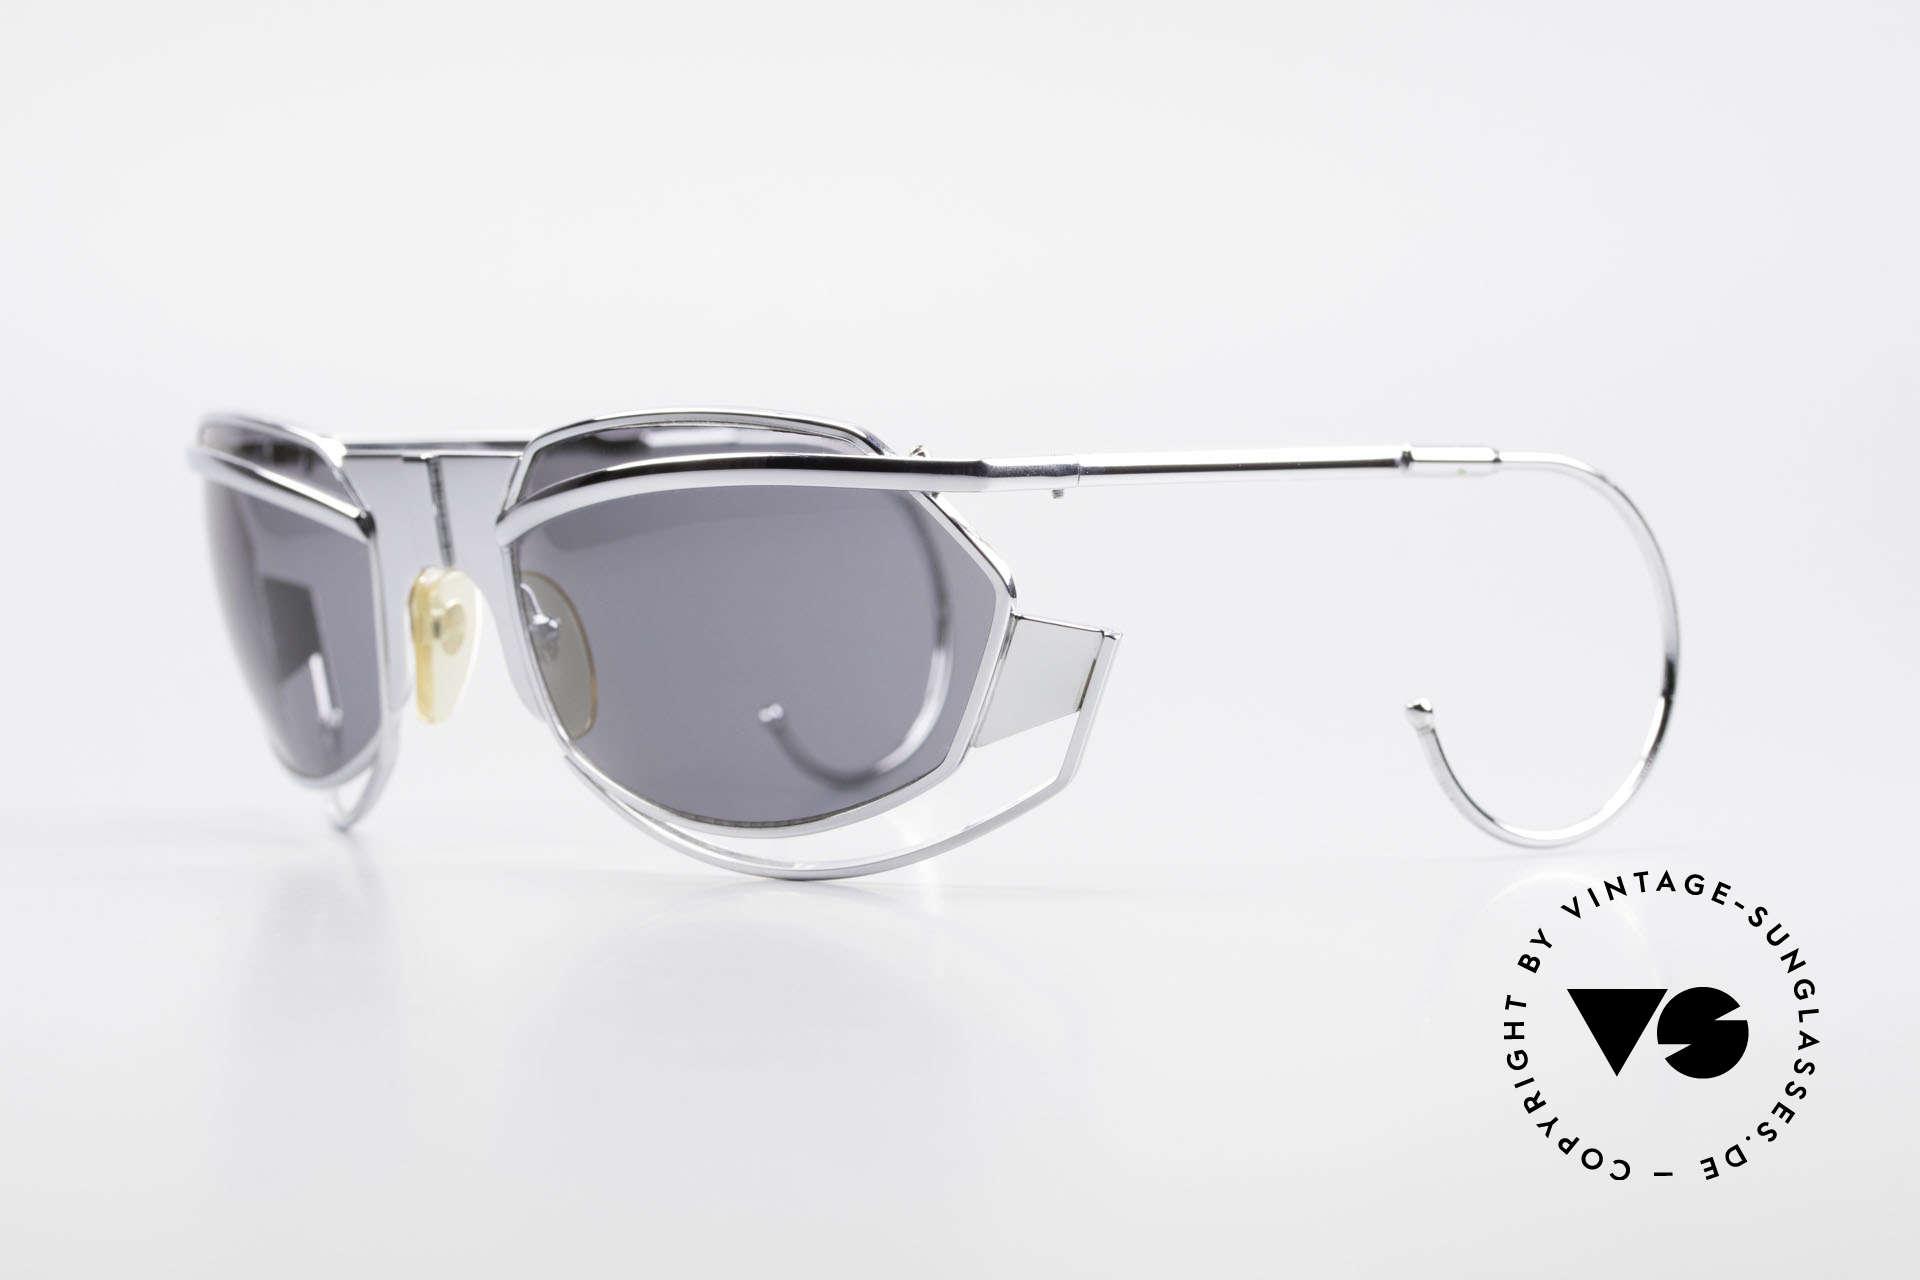 IDC G1 Folding Large Folding Sunglasses 90's, massive metal frame (monolithic); top craftsmanship, Made for Men